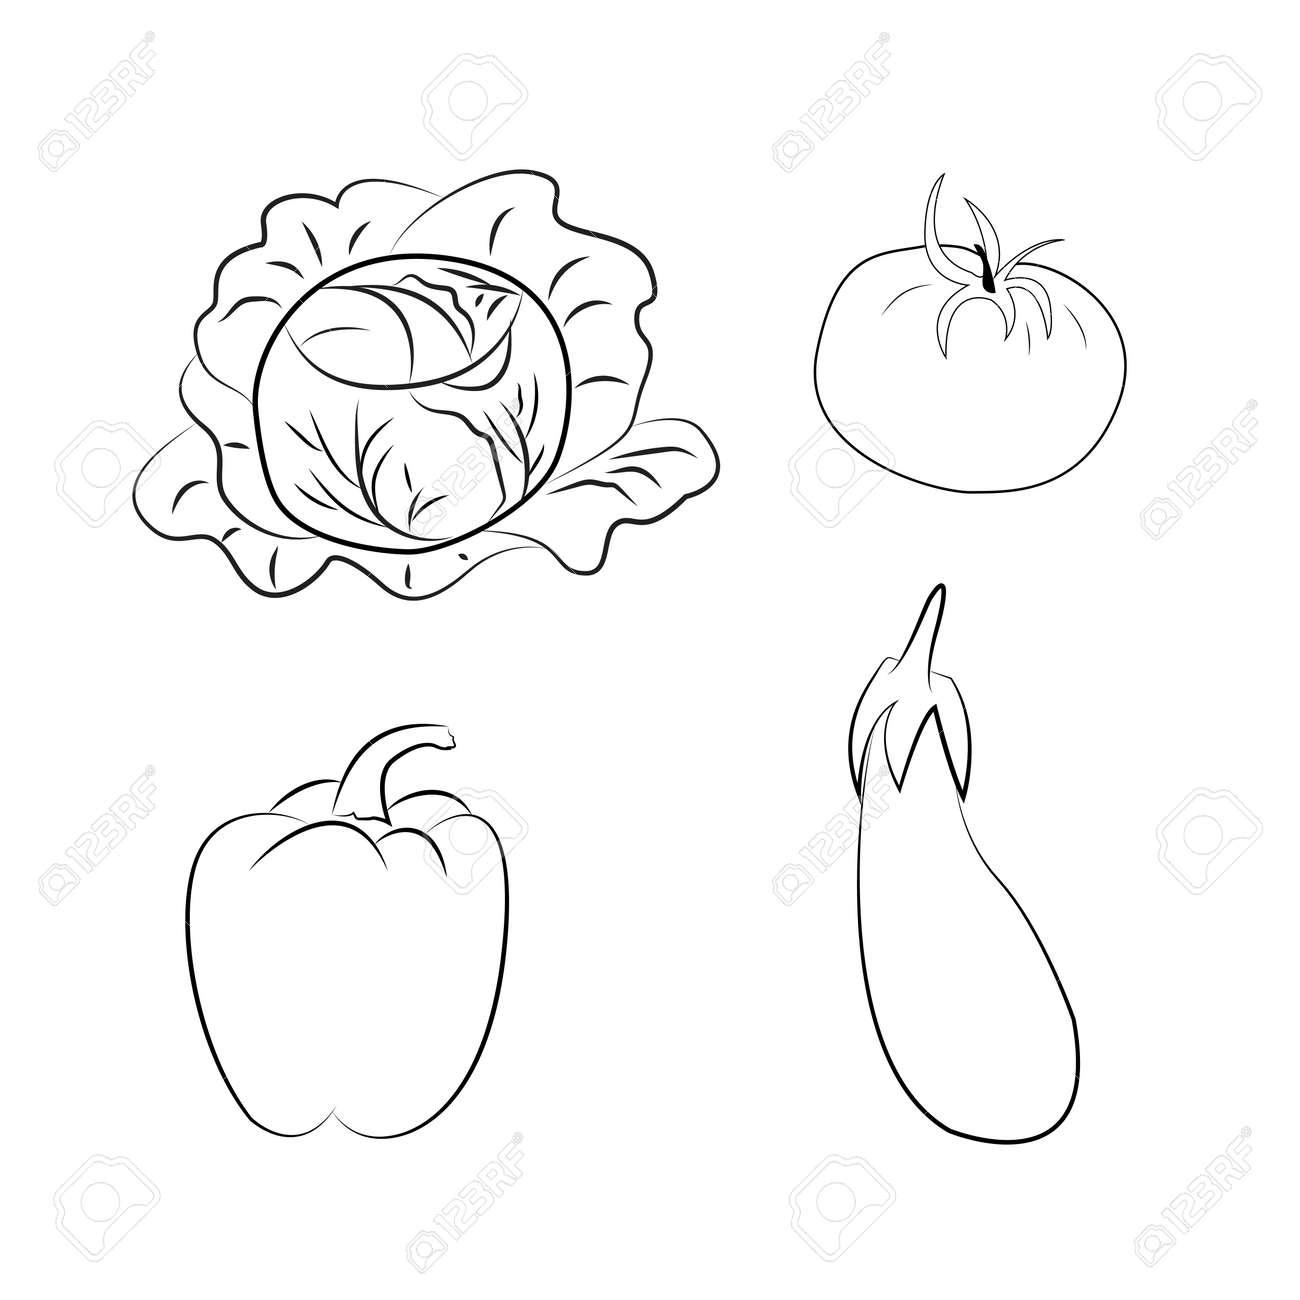 Set Of Vegetables Art Outlines Full Page 29 Original Hand Drawn